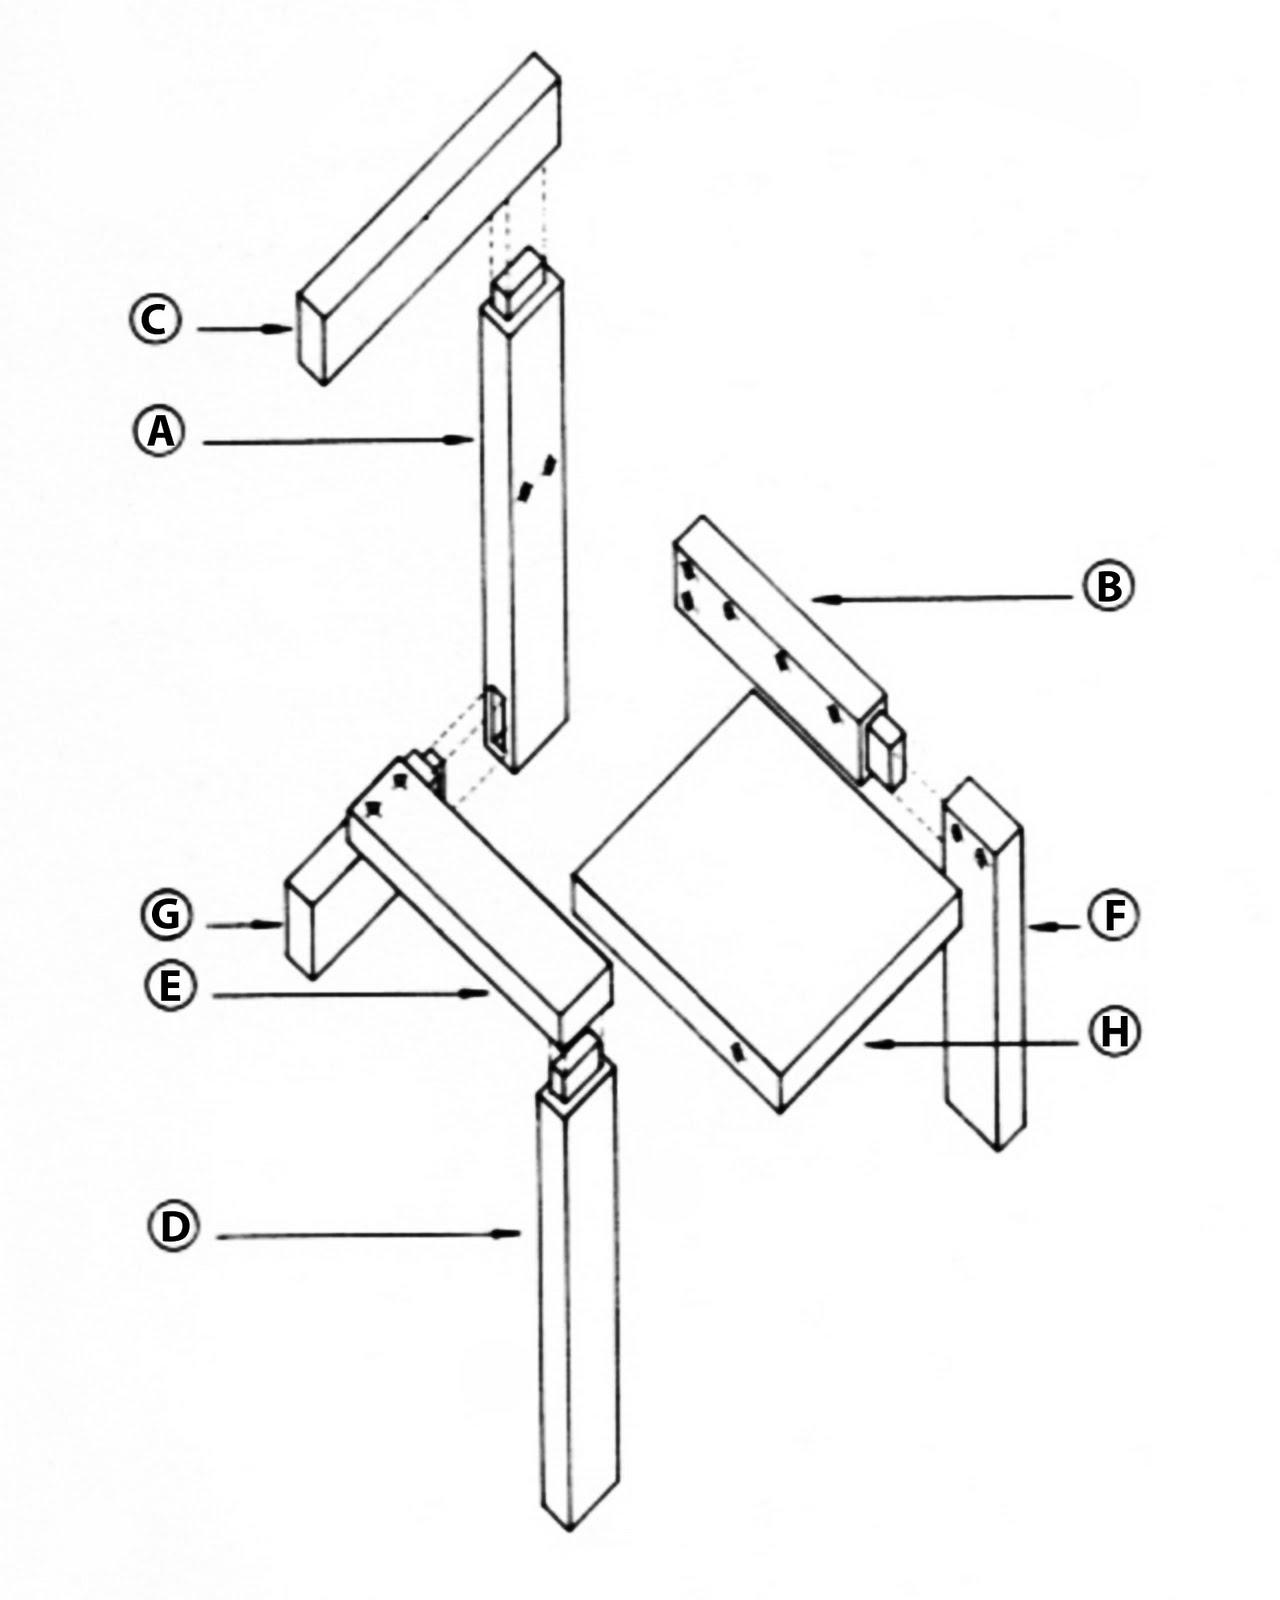 Building gerrit rietveld february 2011 for Steltman stoel afmetingen